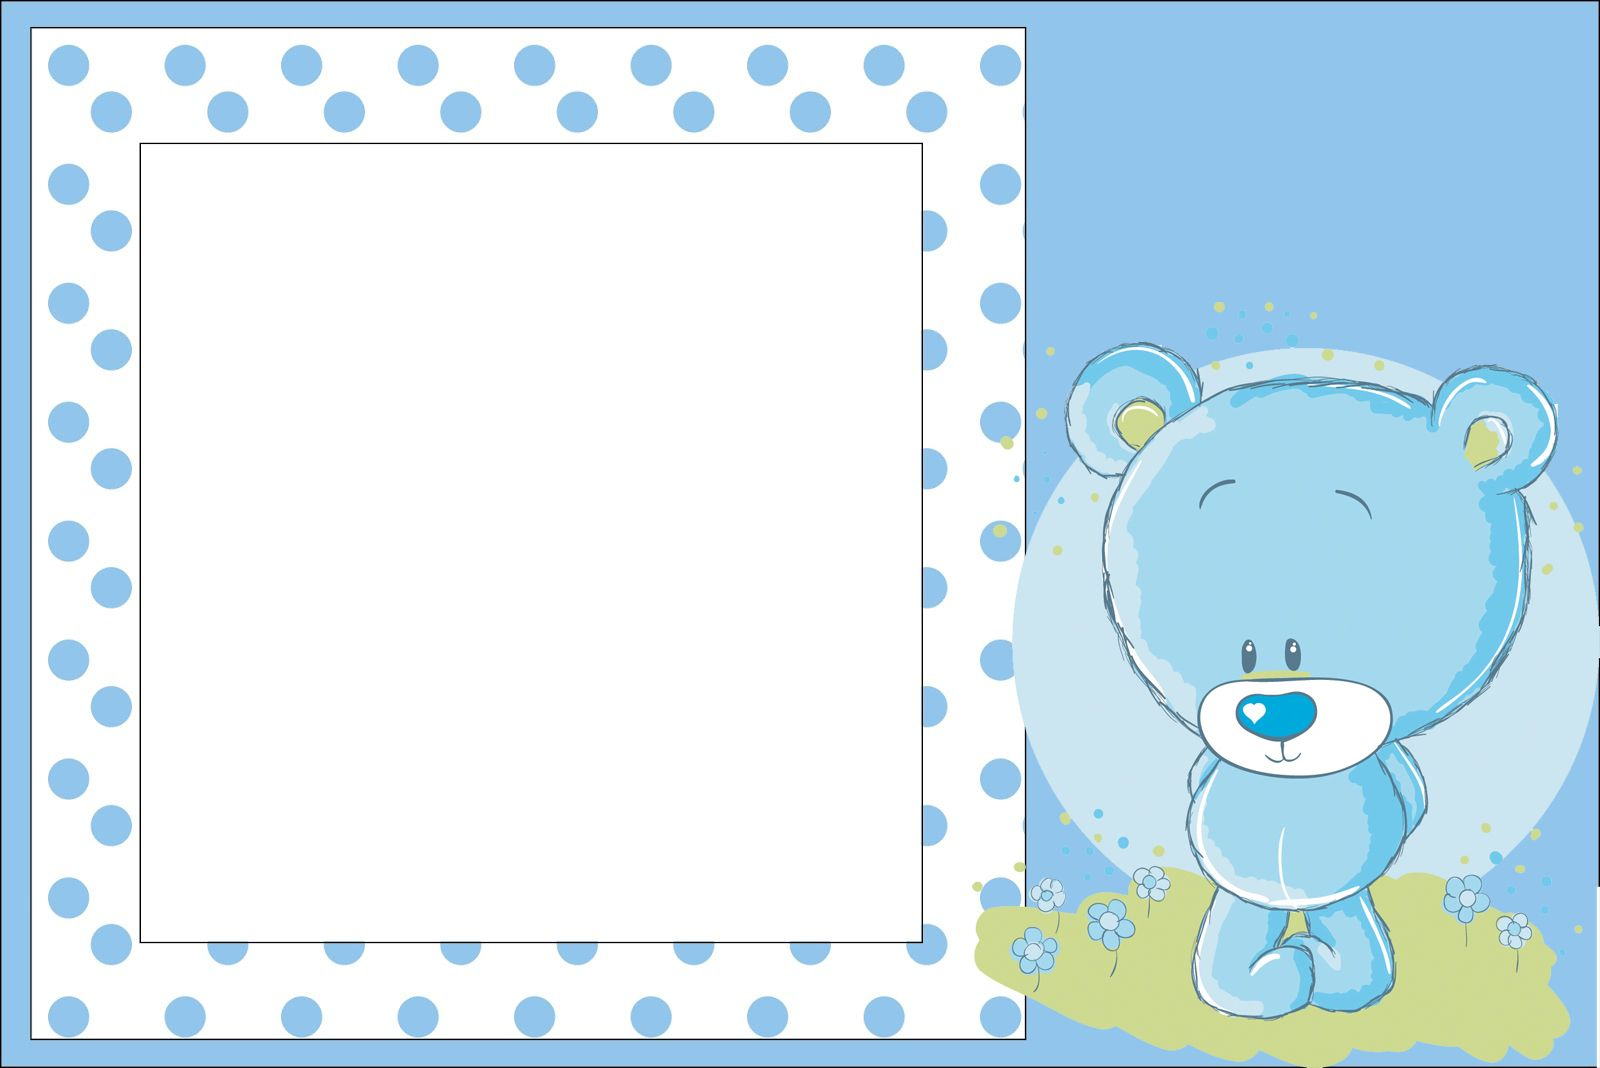 URSO1+Convite2.jpg 1 600×1 068 пиксел.